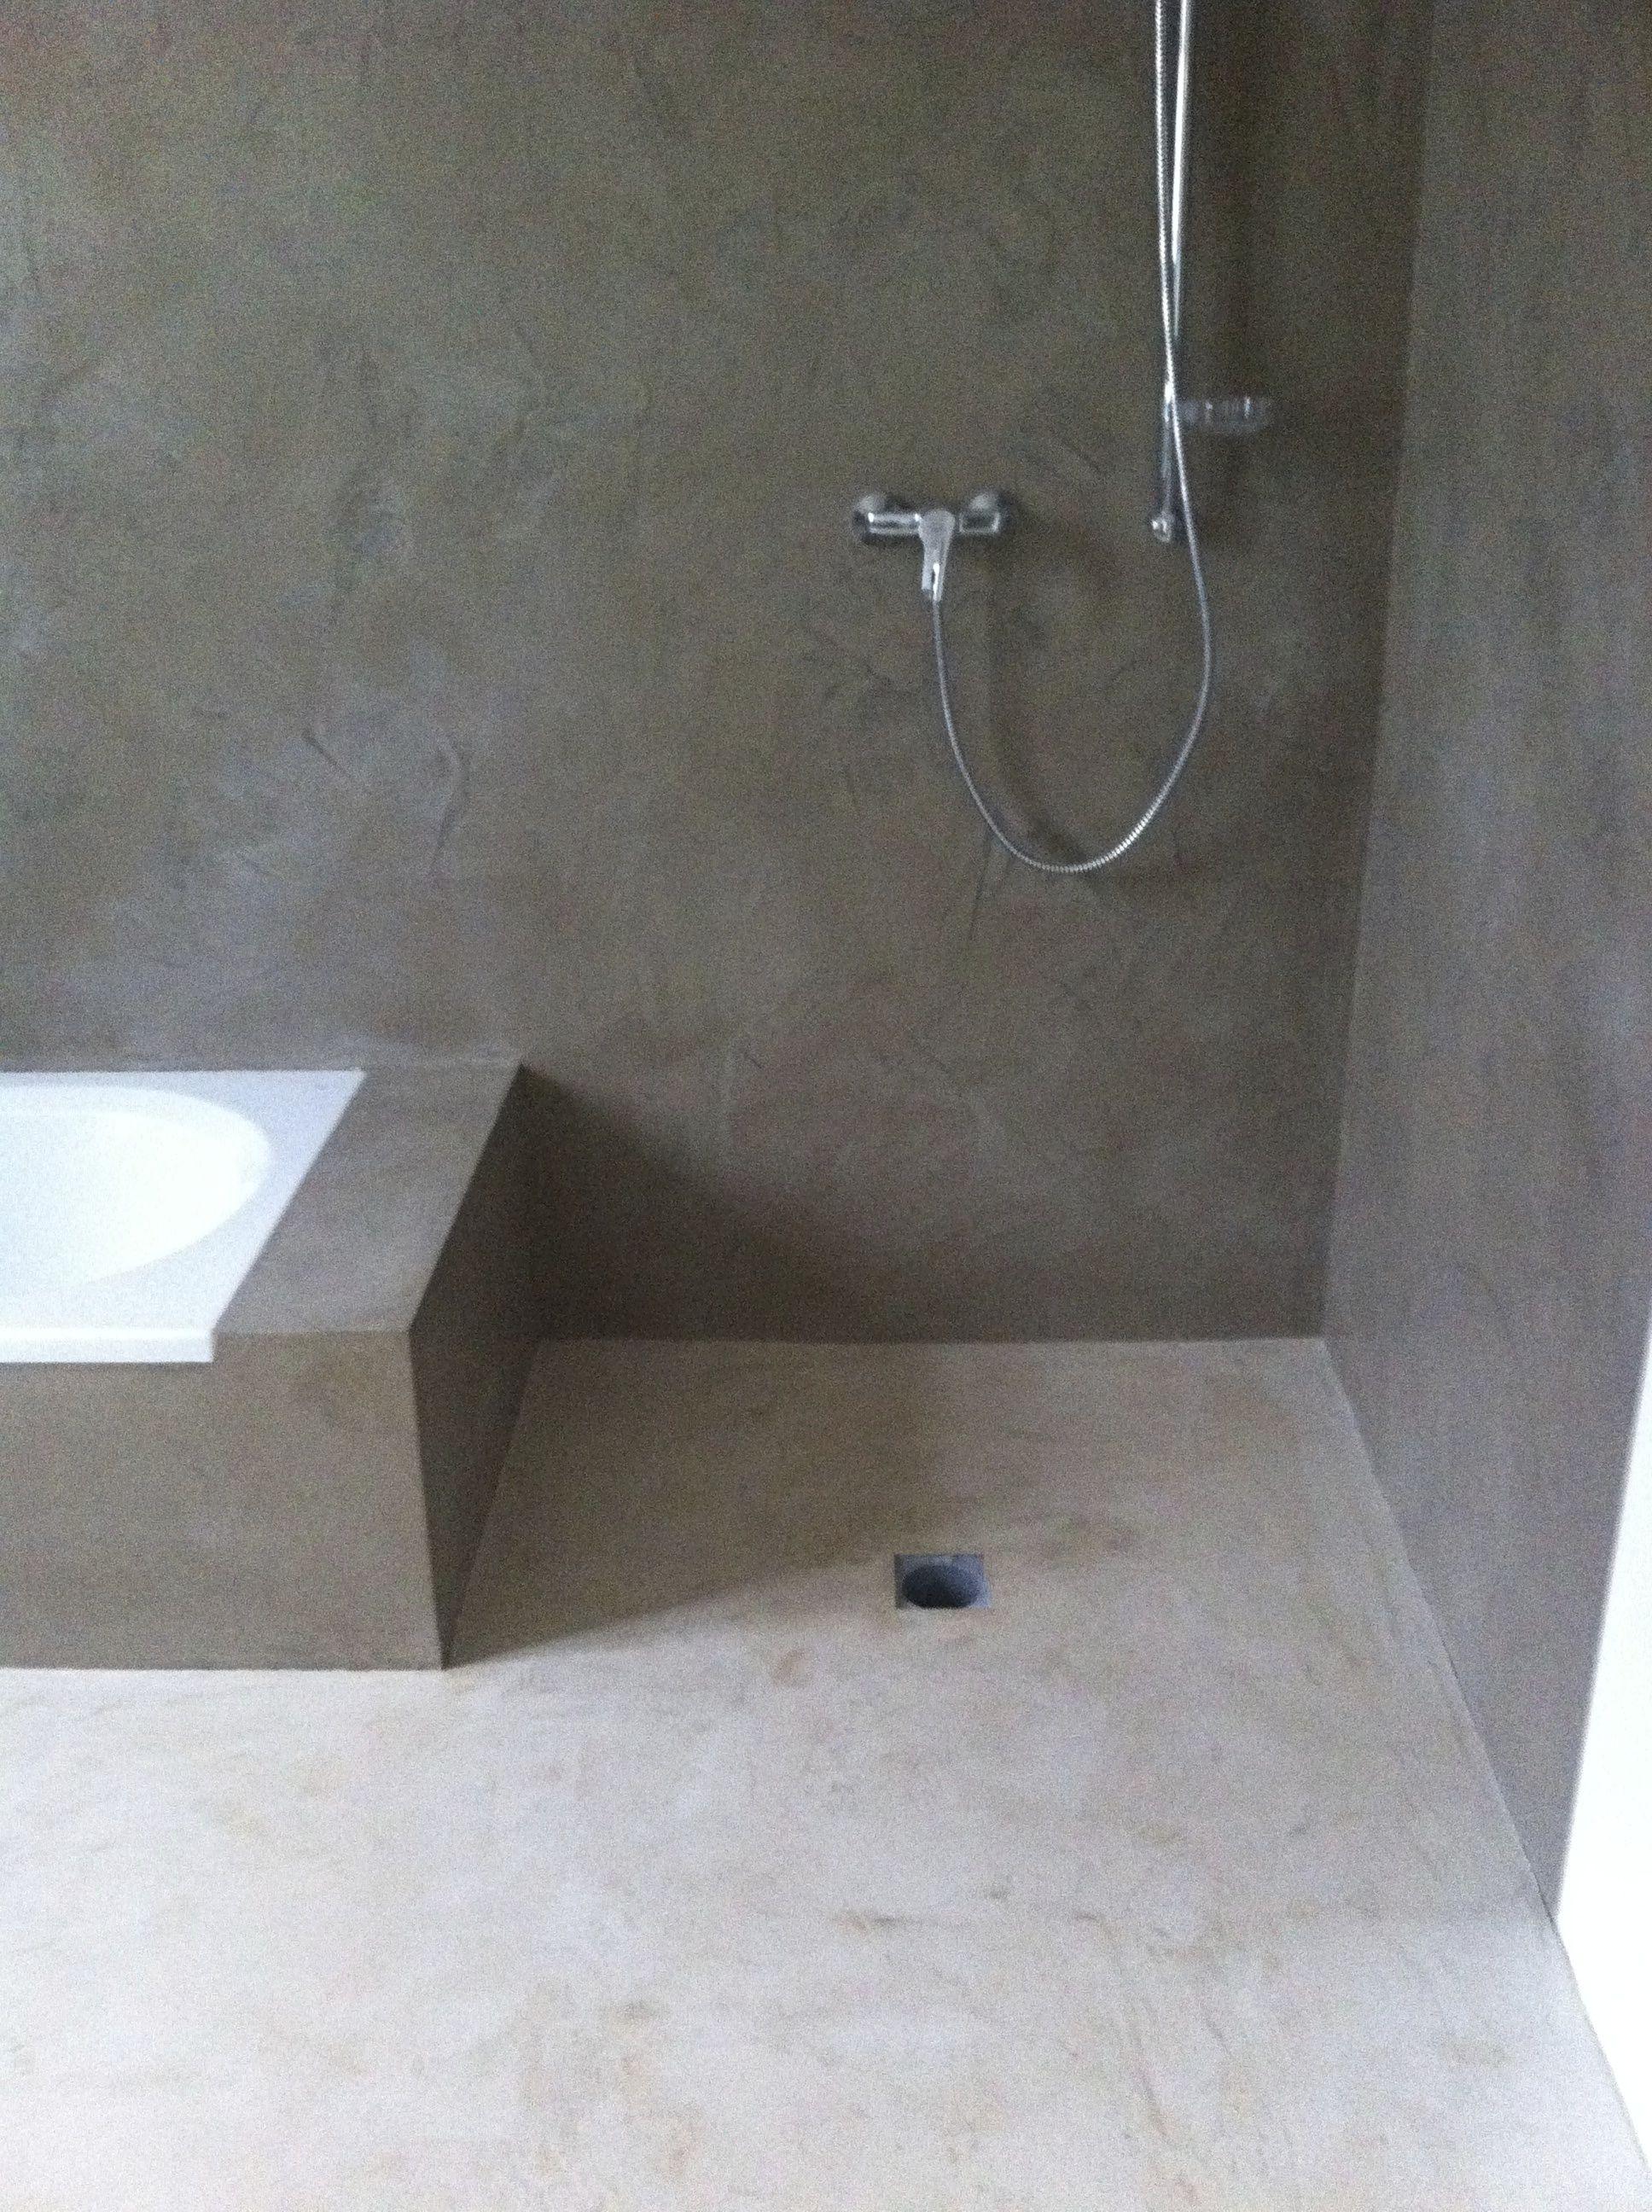 Boden Und Wand Beton Cire Original Work In Progress Material Uber Betoncire At Badezimmerboden Badezimmer Boden Badezimmer